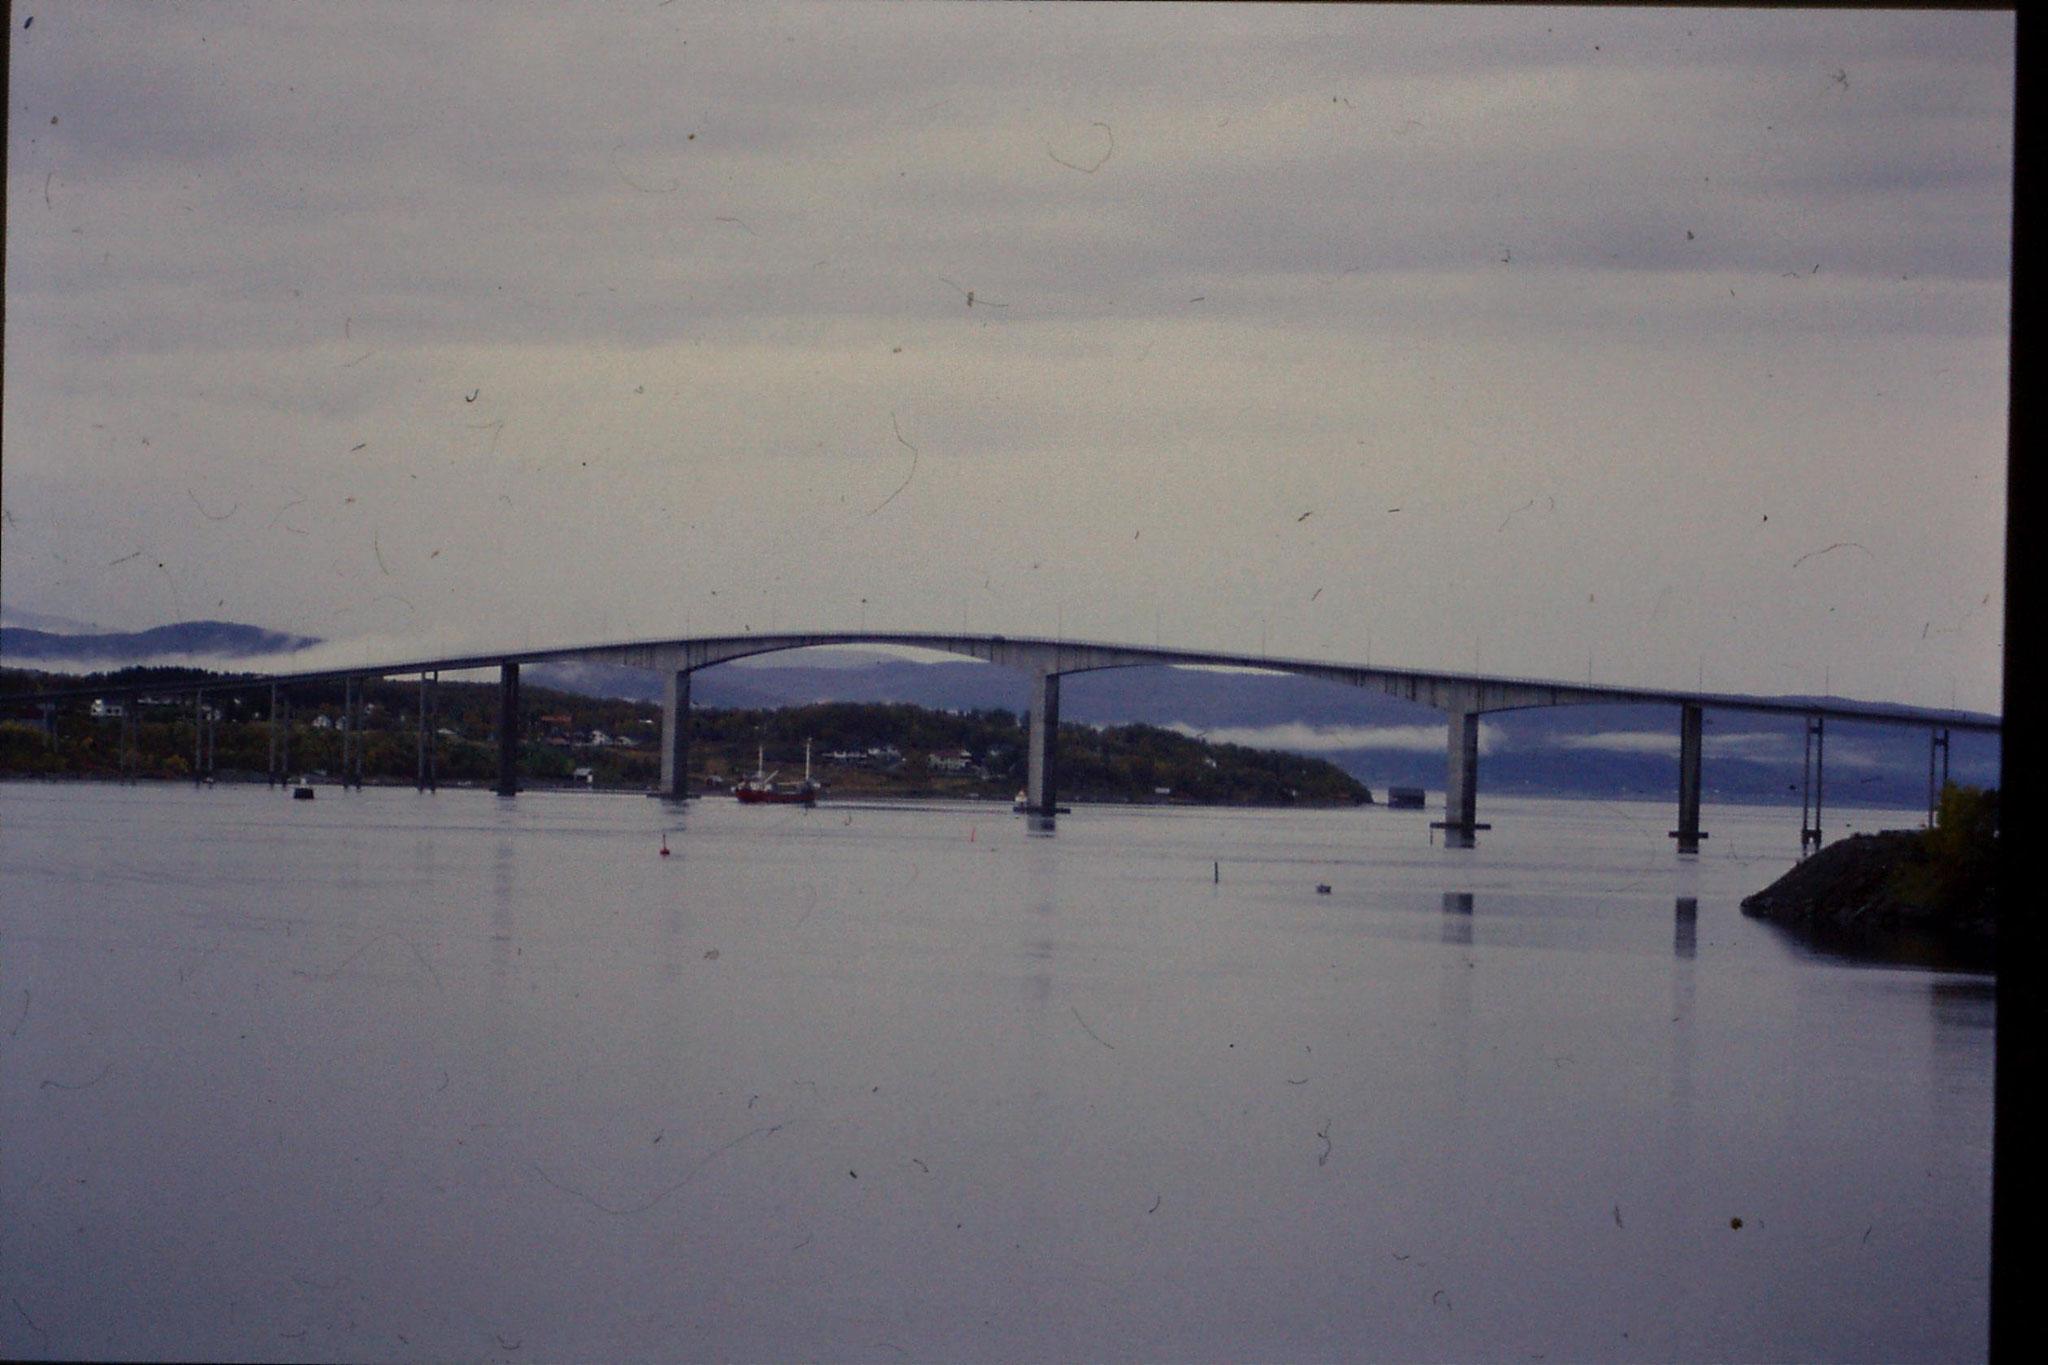 25/9/1988: 29: fishing boat going through bridge